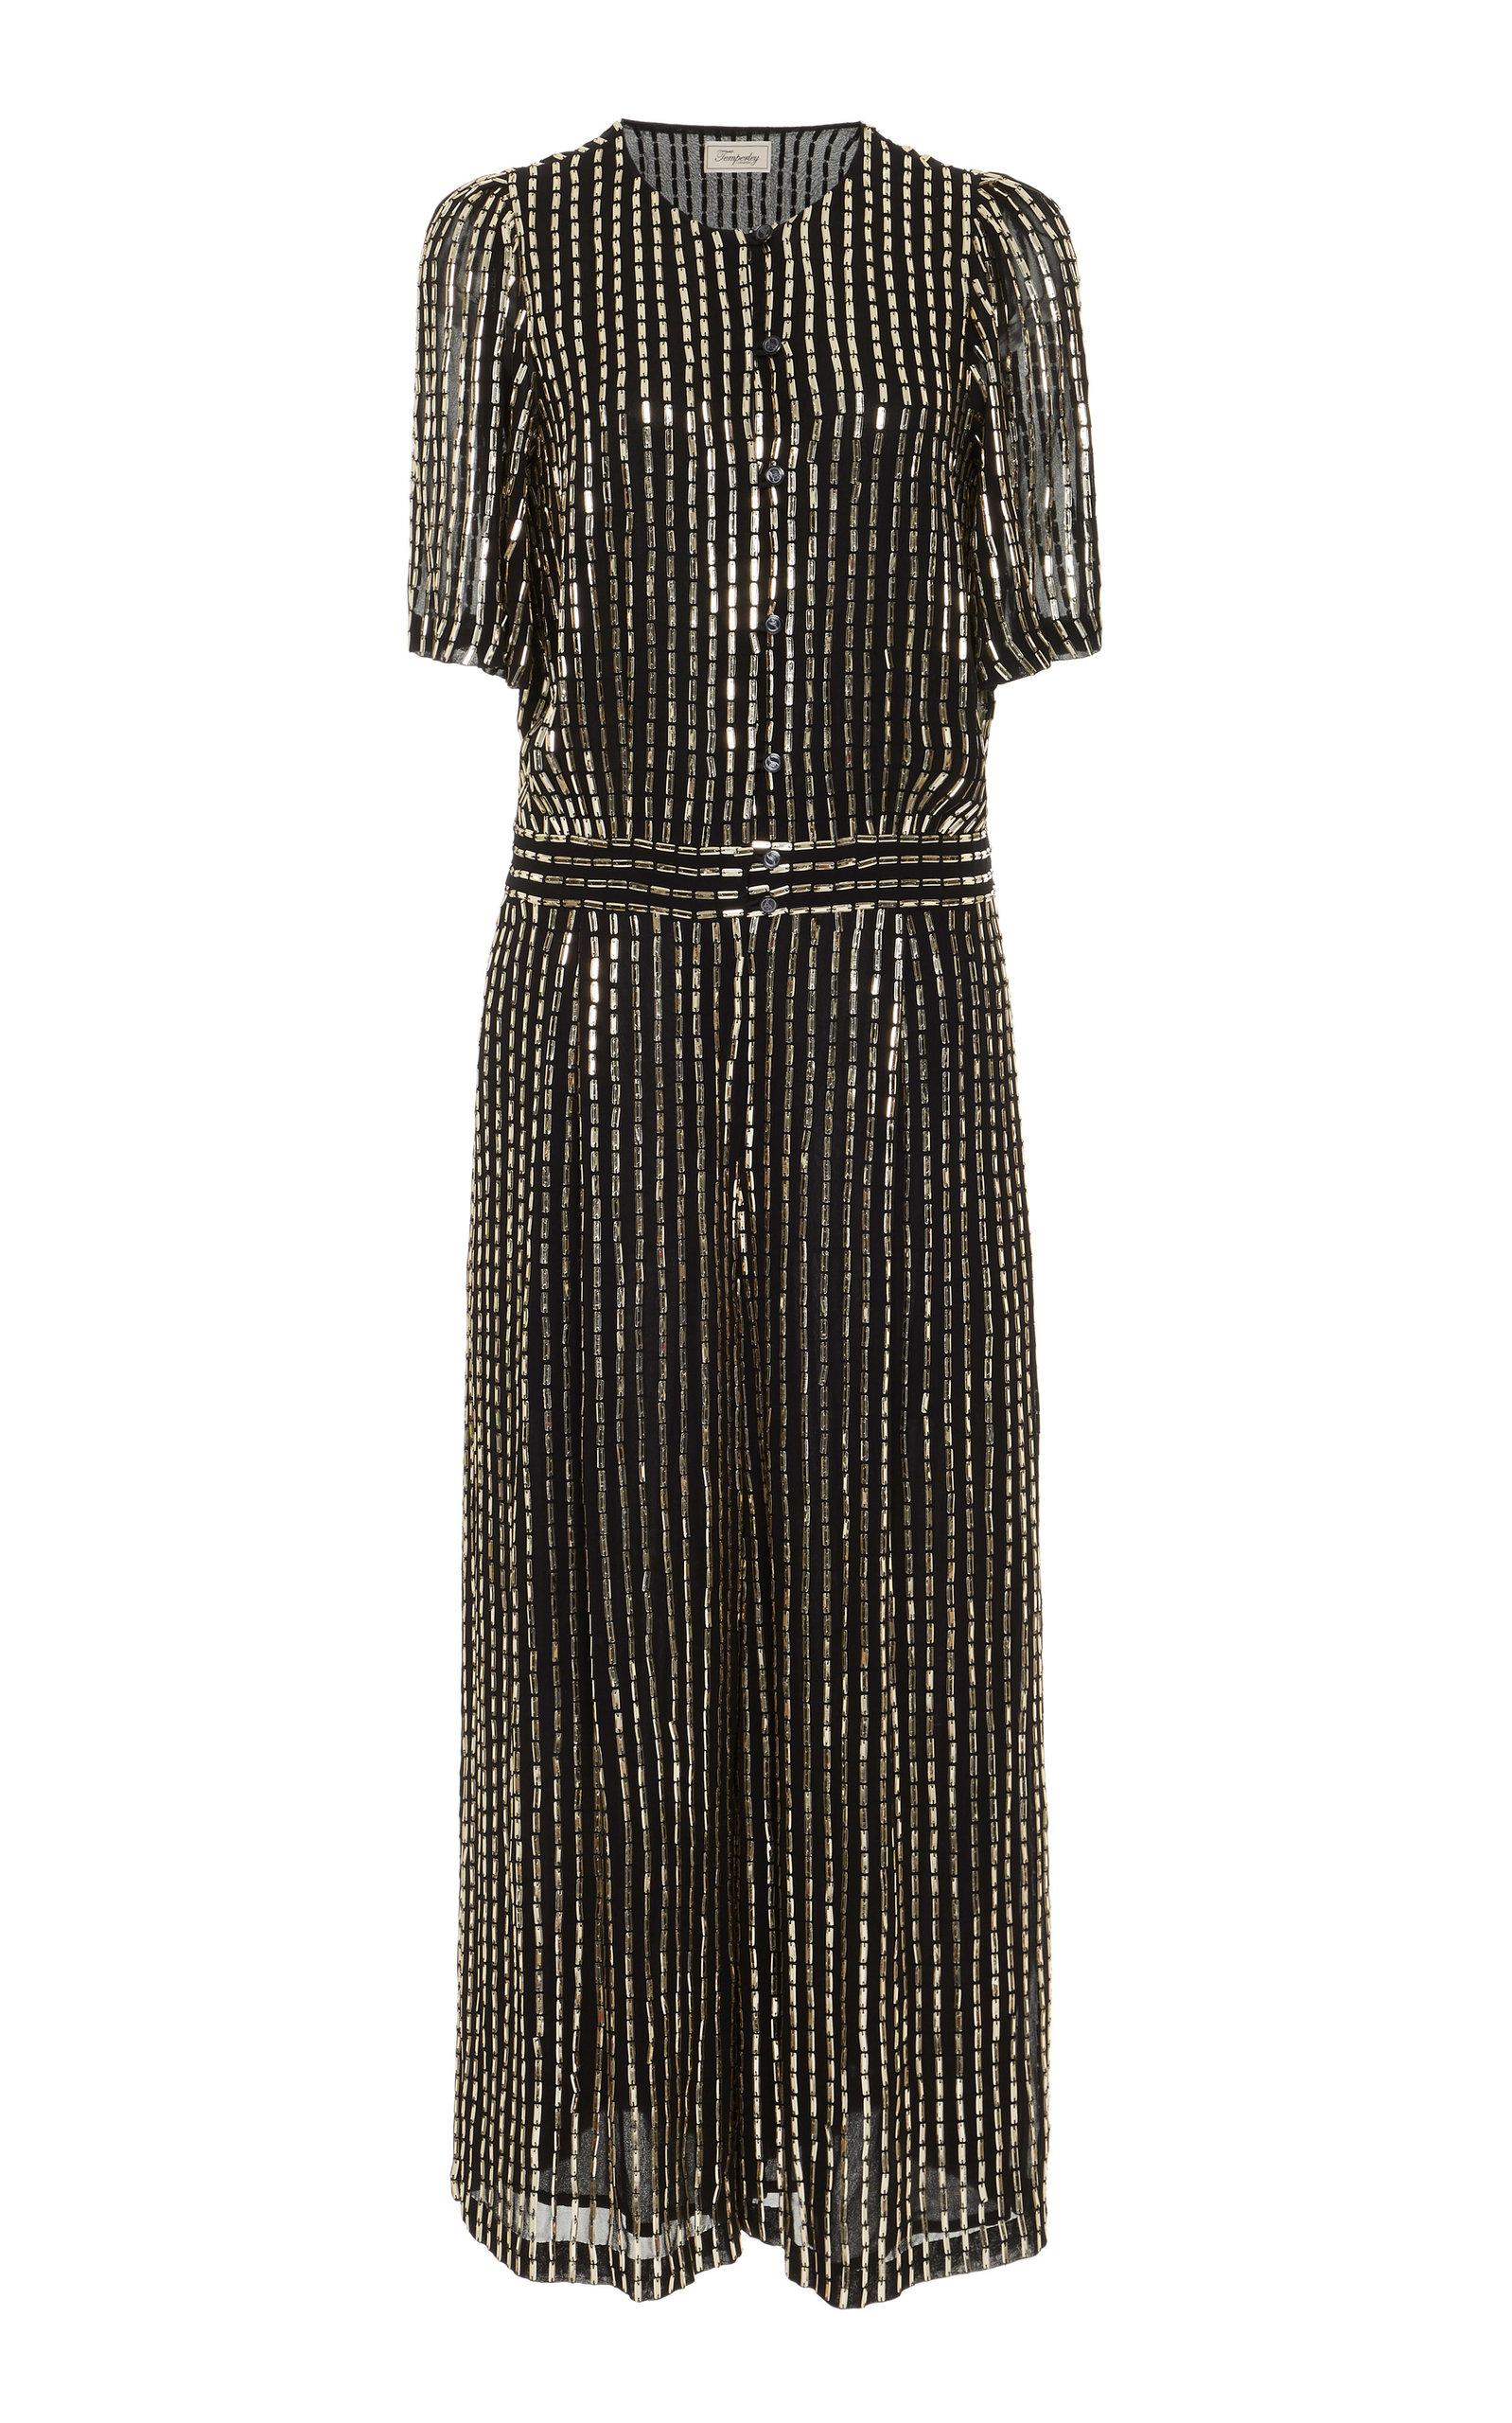 TEMPERLEY LONDON Silver Beaded Short Sleeve Dress in Black